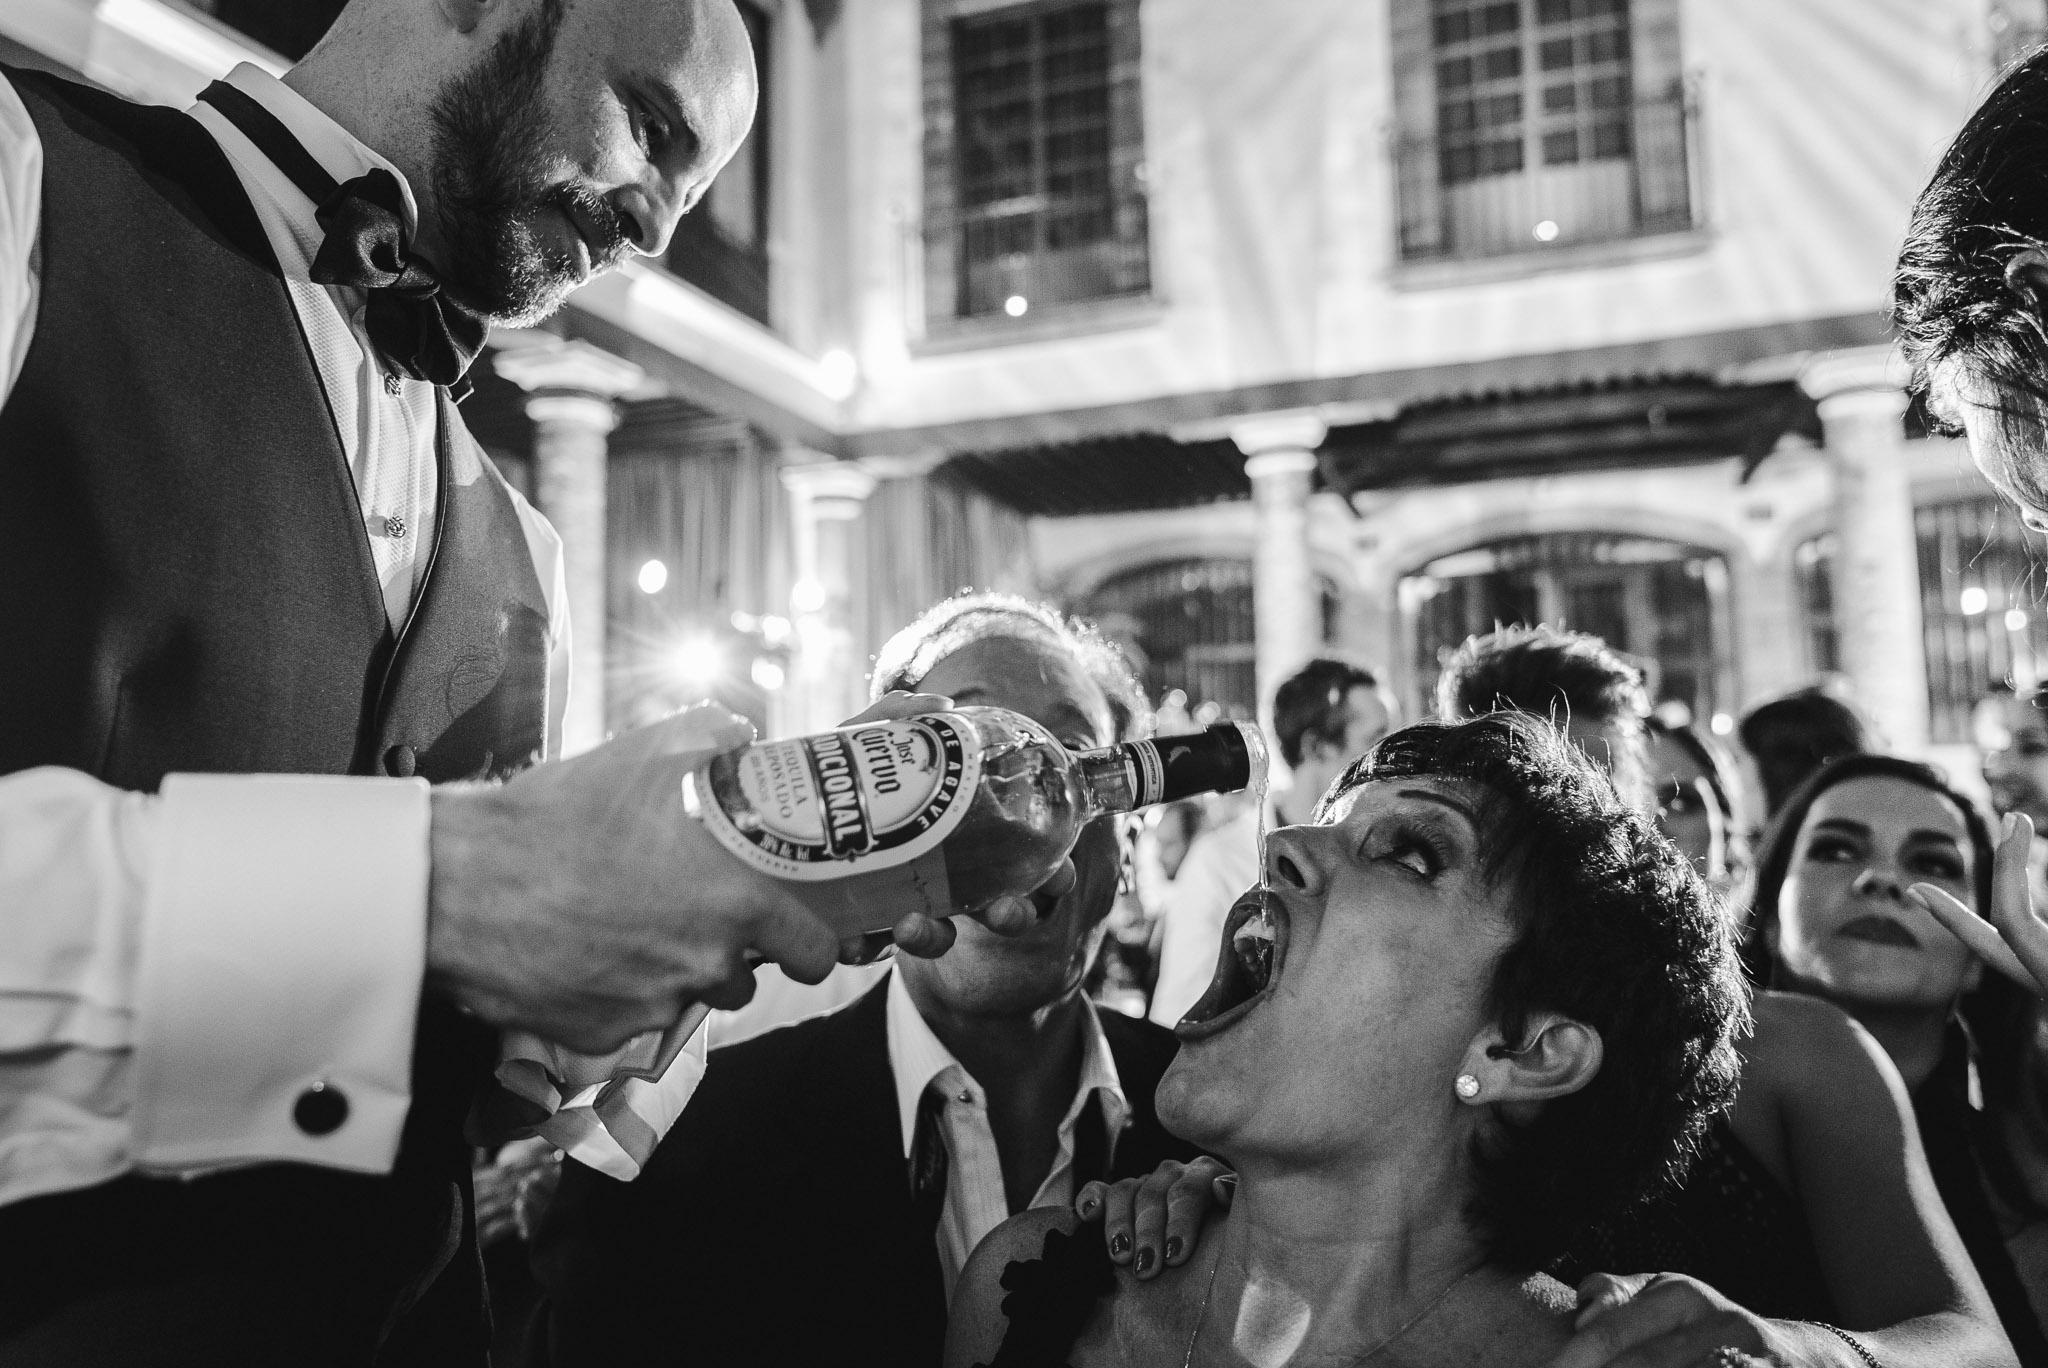 ©www.mauriziosolisbroca.com-20161002maurizio-solis-broca-mexico-canada-wedding-photographer20161002DSC00359-2-Edit.jpg